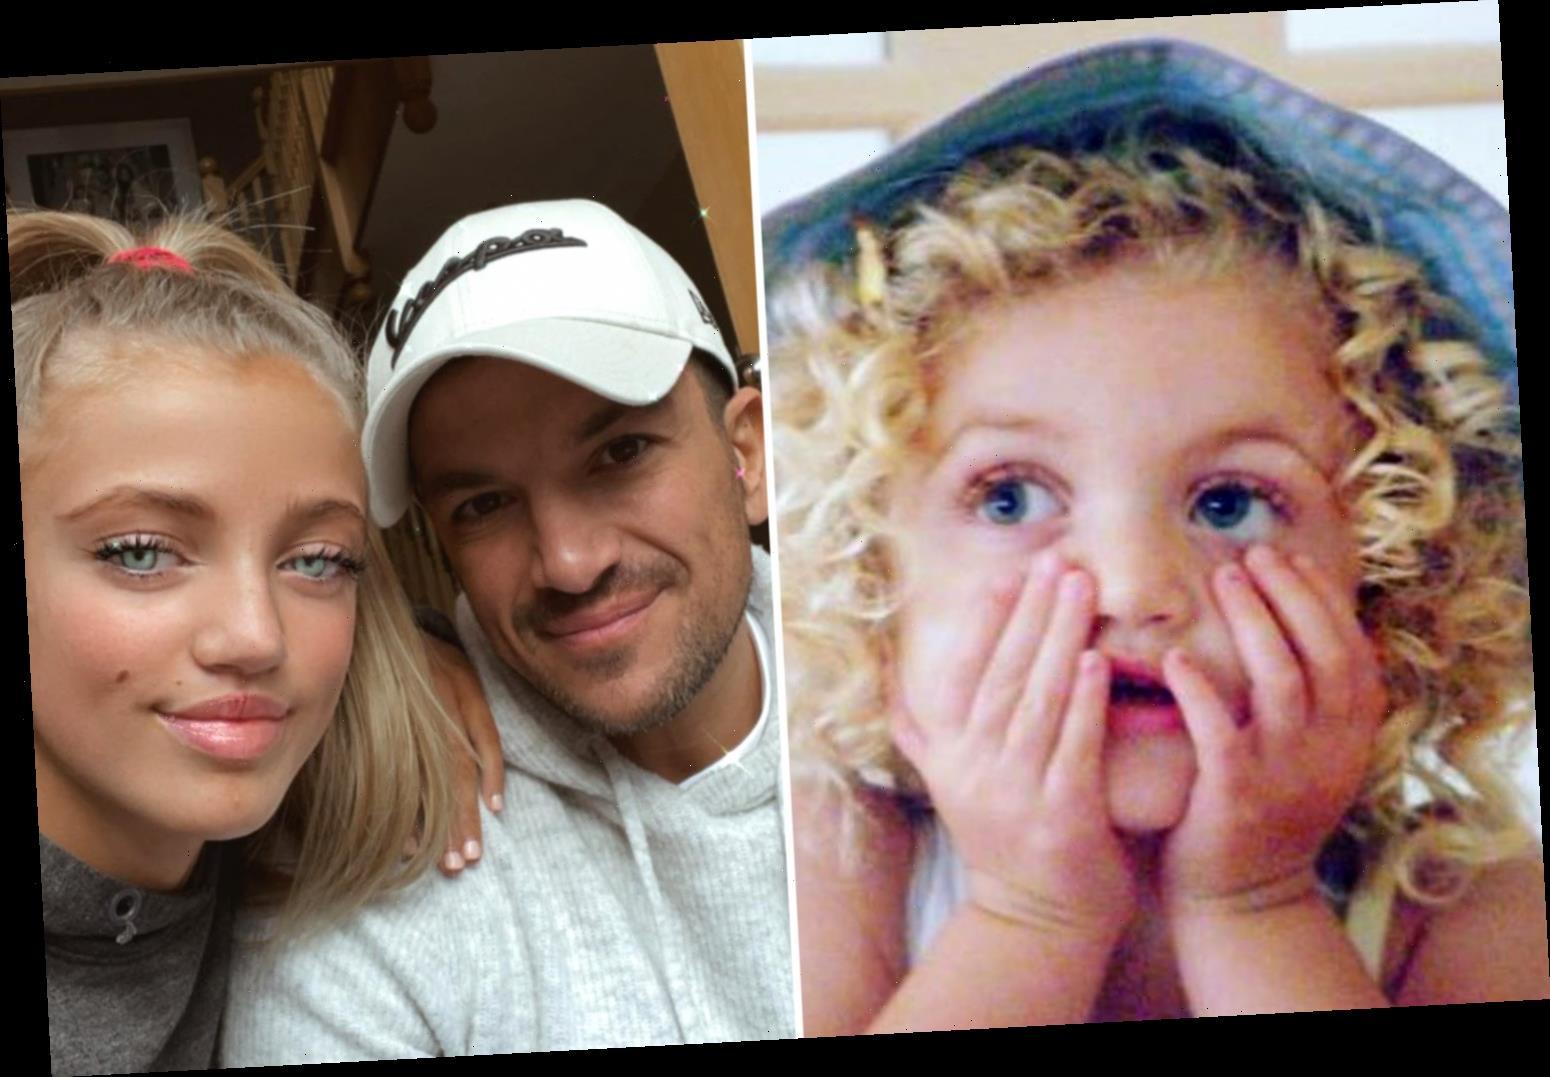 Peter Andre has sweet exchange with Katie Price's ex Kieran Hayler over throwback snap of Princess